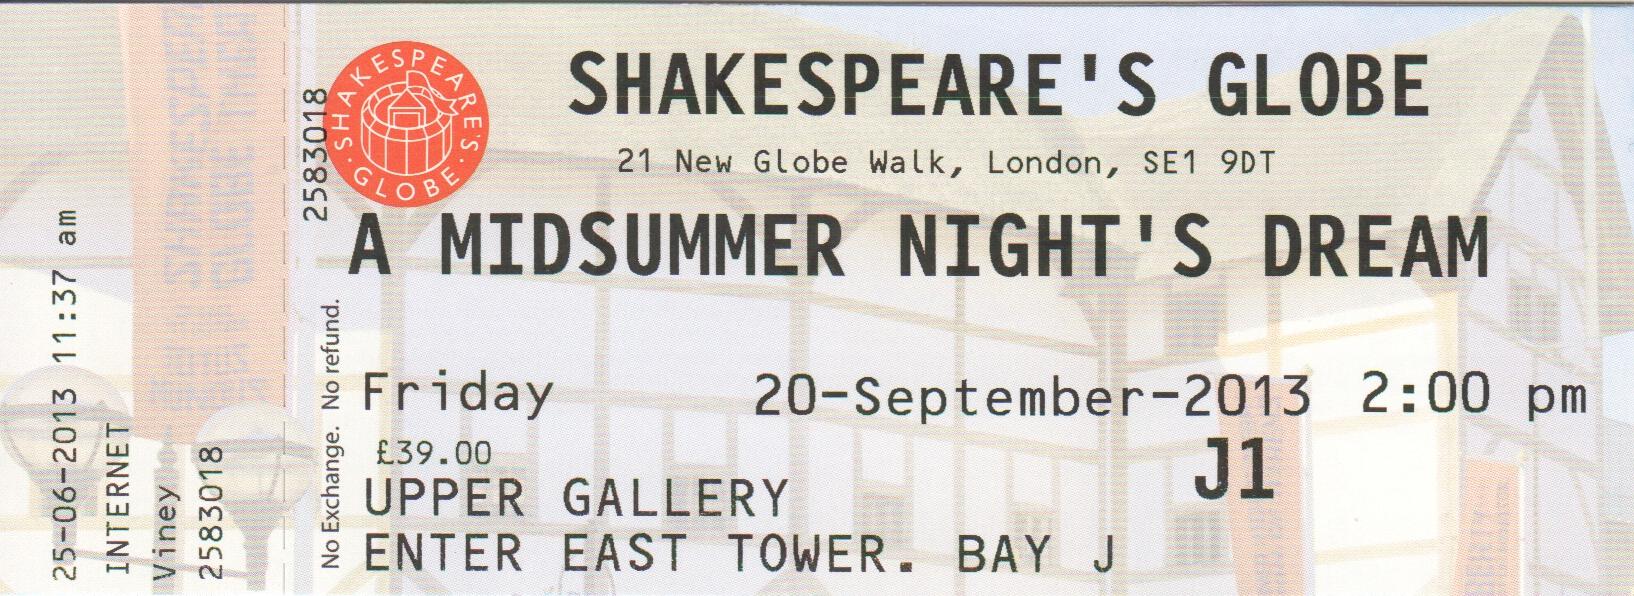 shakespeare's hamlet essay